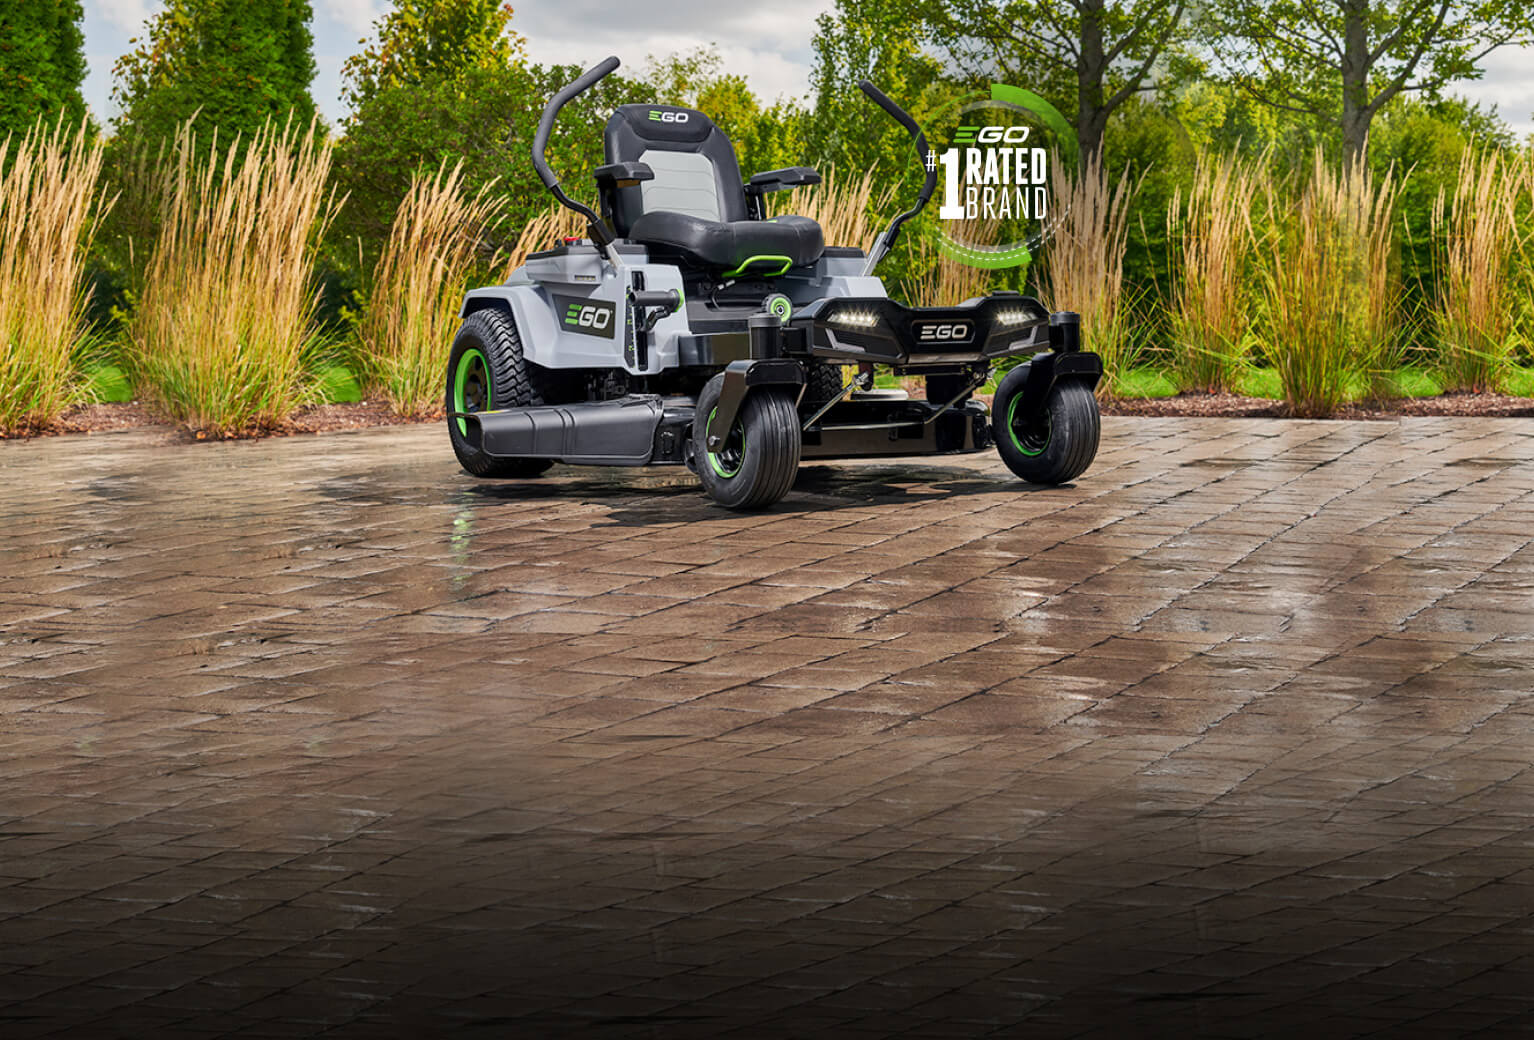 Z6 Riding Mower